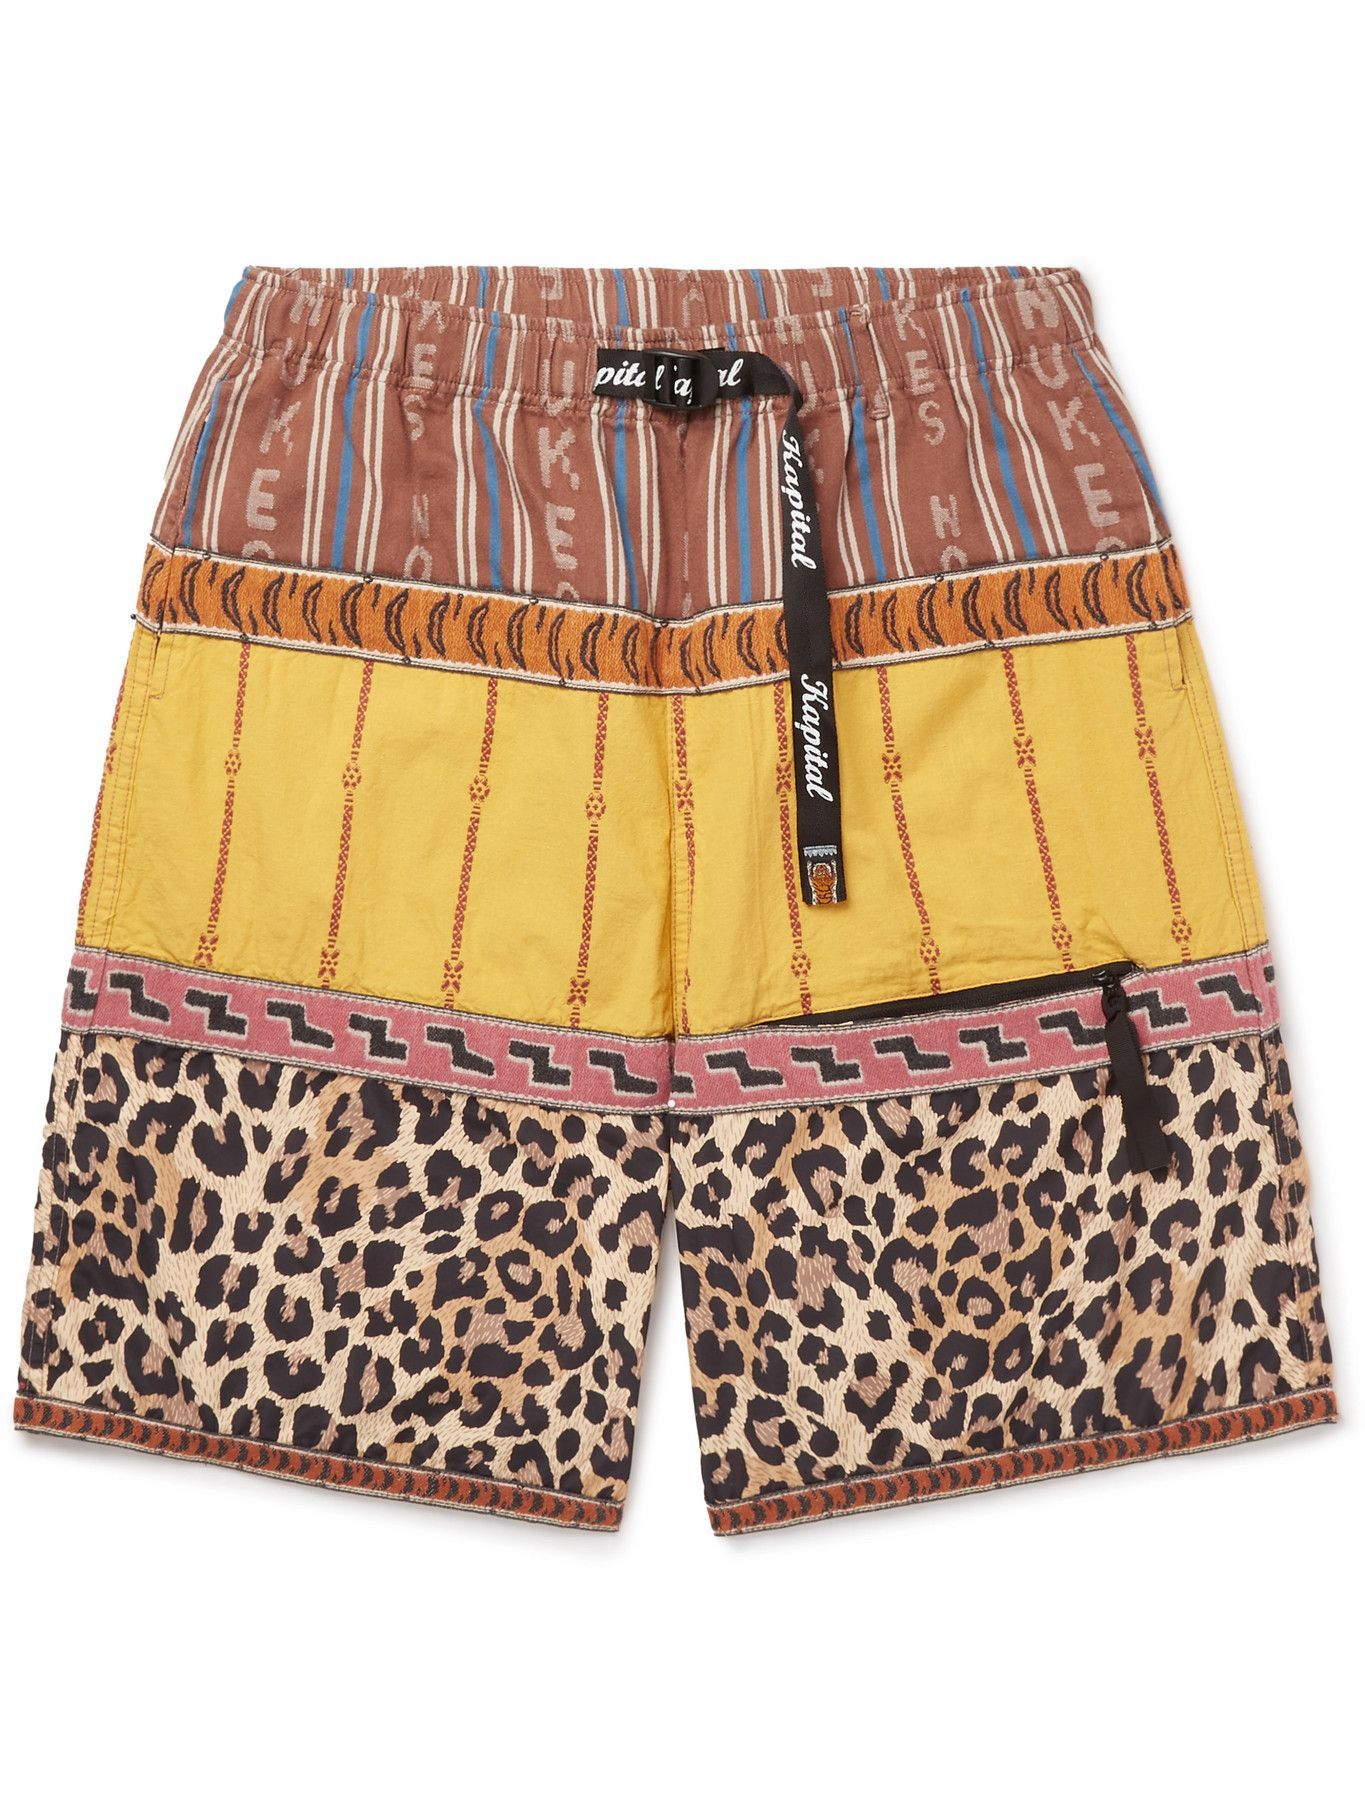 KAPITAL - Wide-Leg Patchwork Poplin Shorts - Yellow